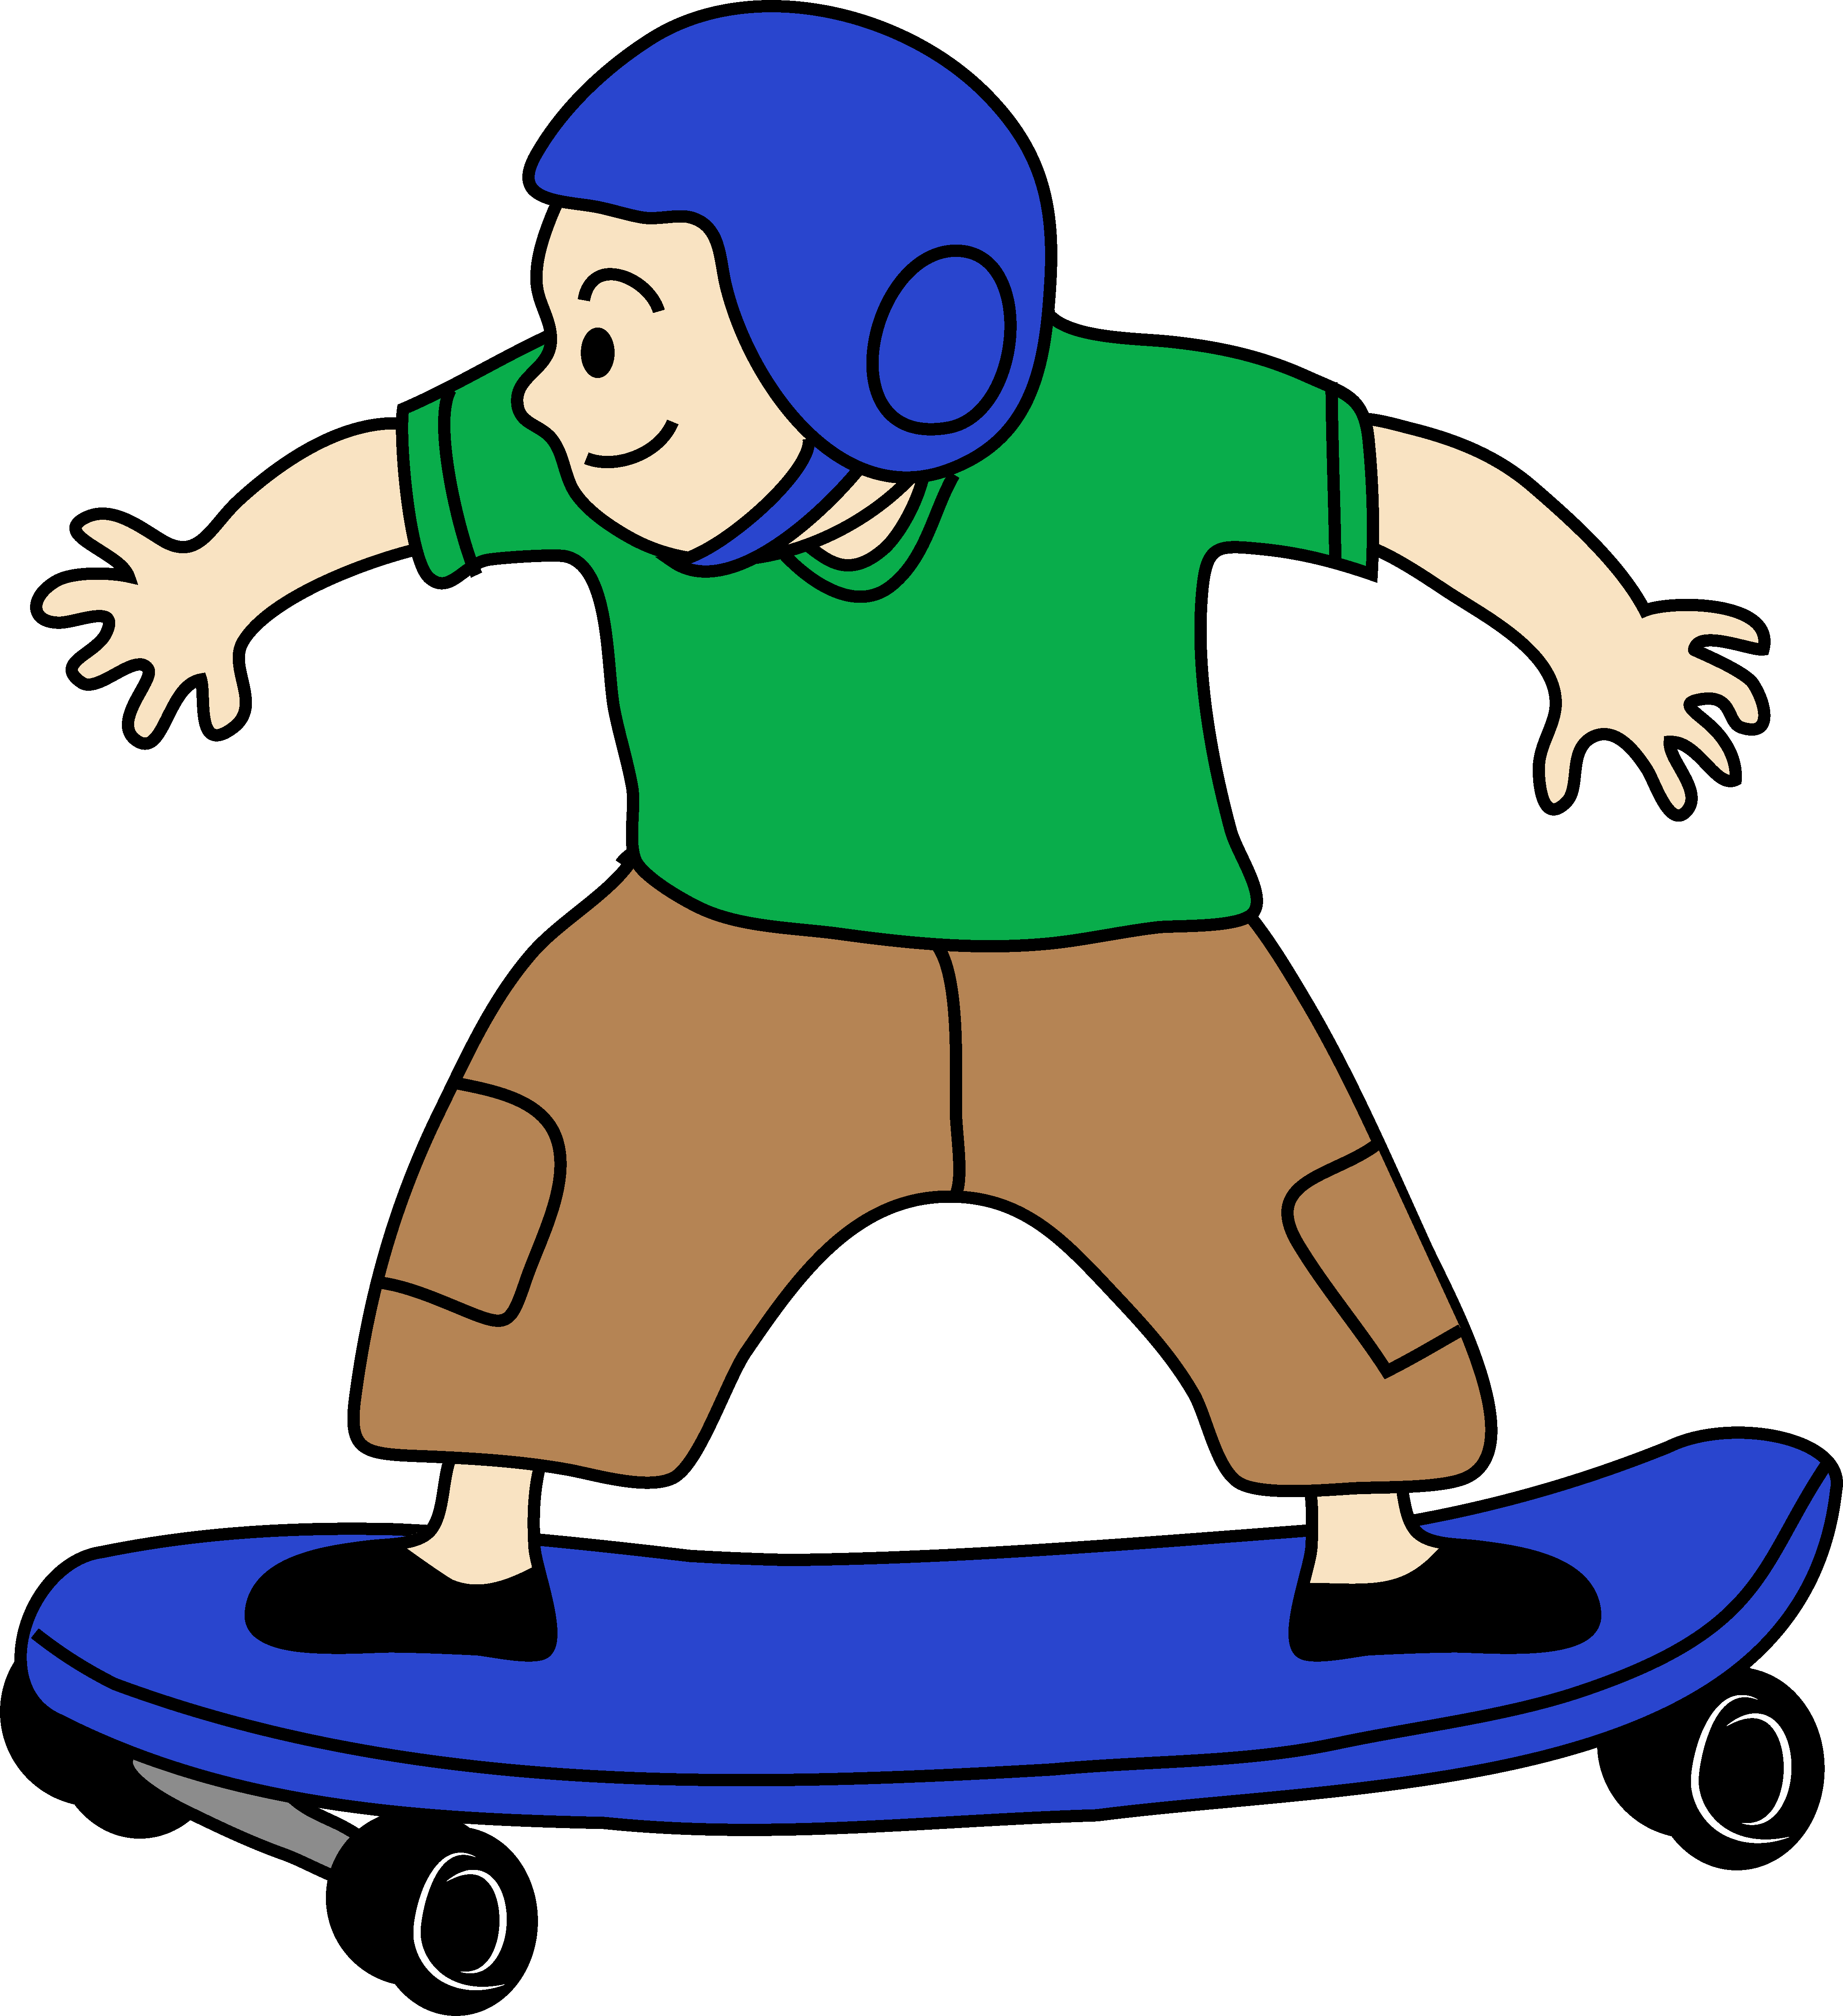 Skateboard Clip Art Free-Skateboard Clip Art Free-9